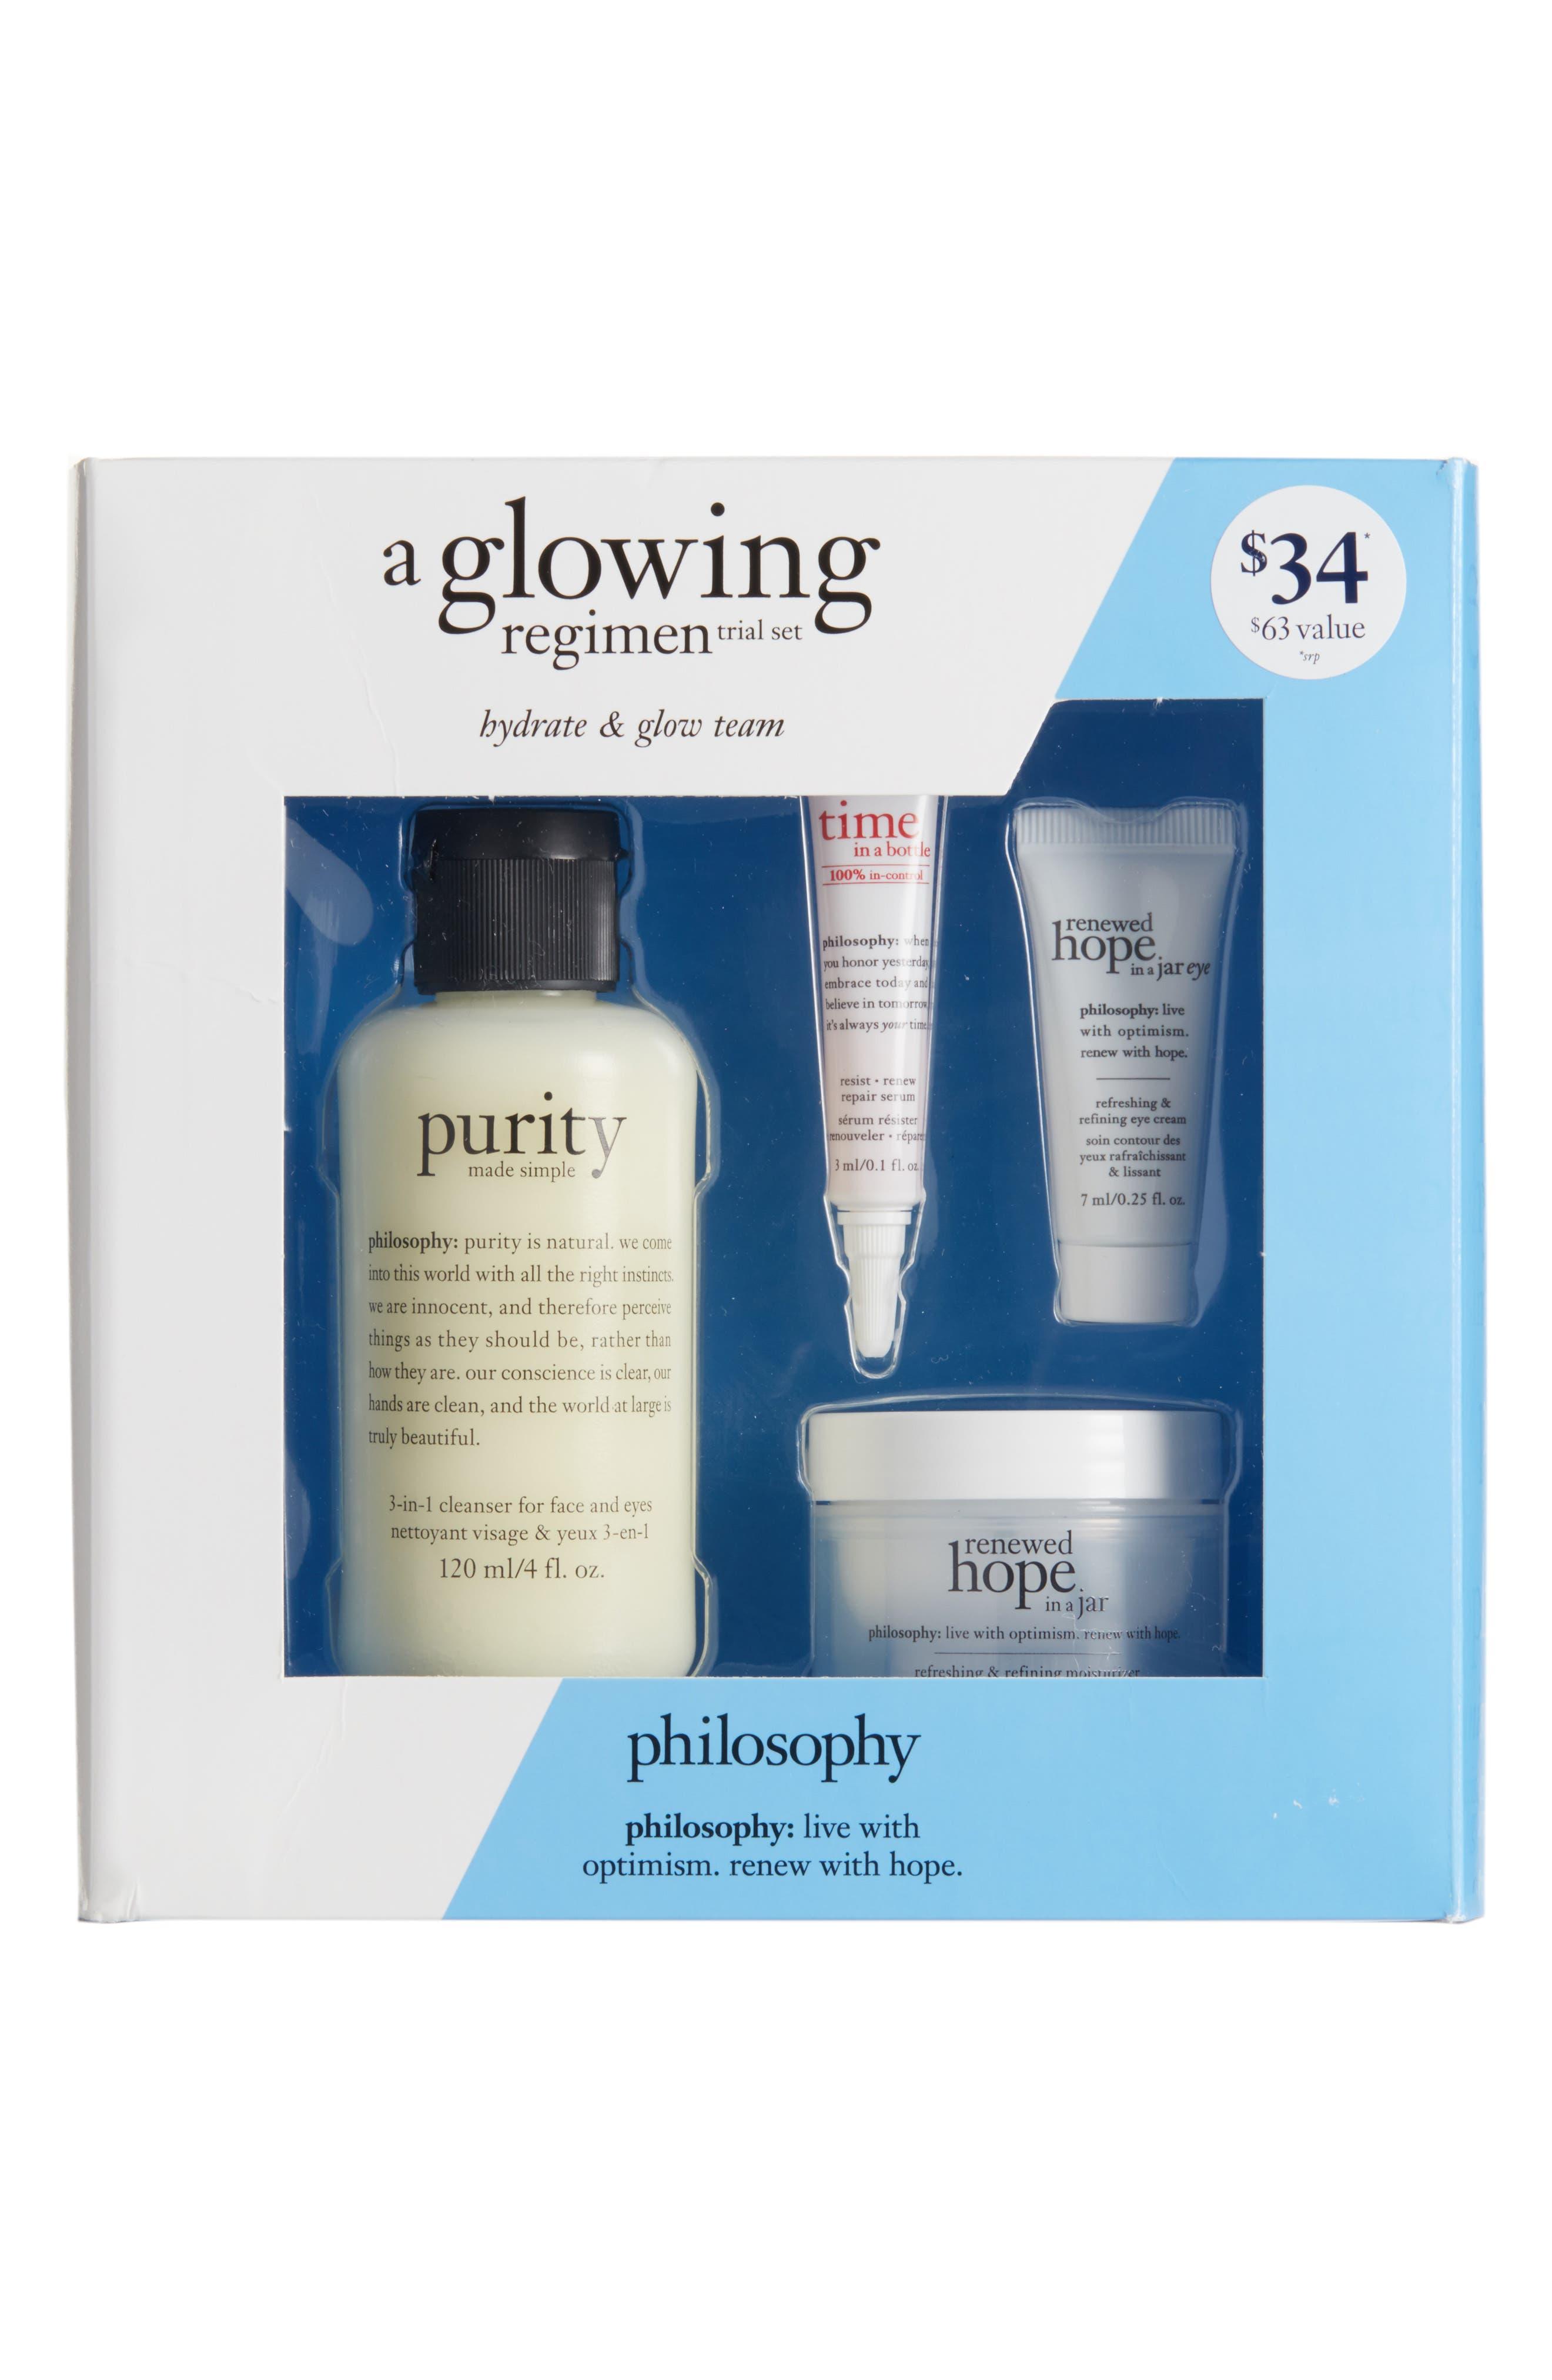 Alternate Image 1 Selected - philosophy glowing regimen set ($63 Value)